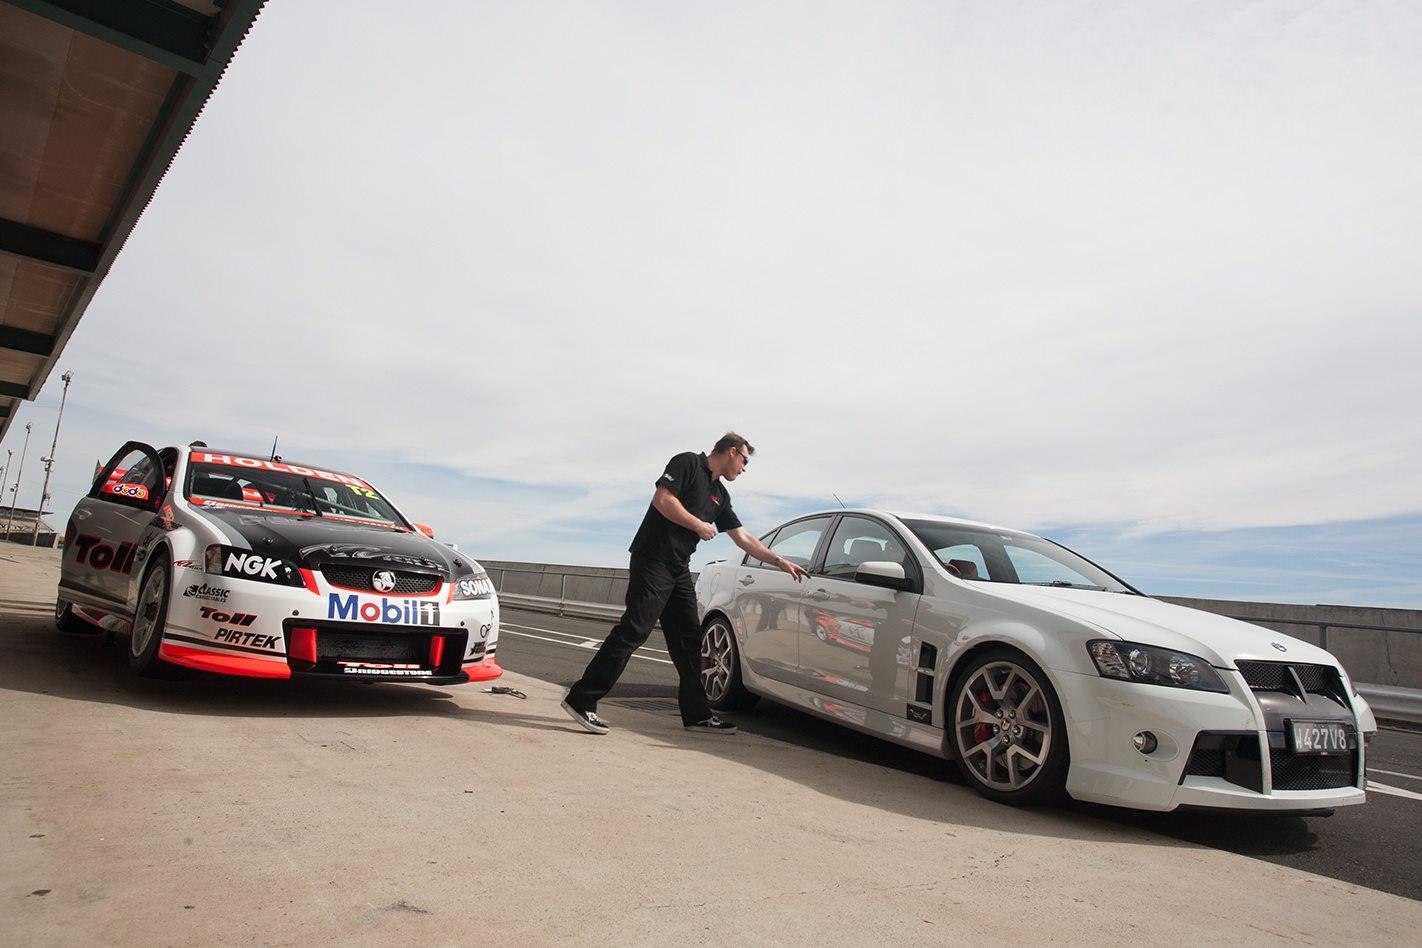 HSV-V8-Supercar-vs-HSV-W427-front.jpg